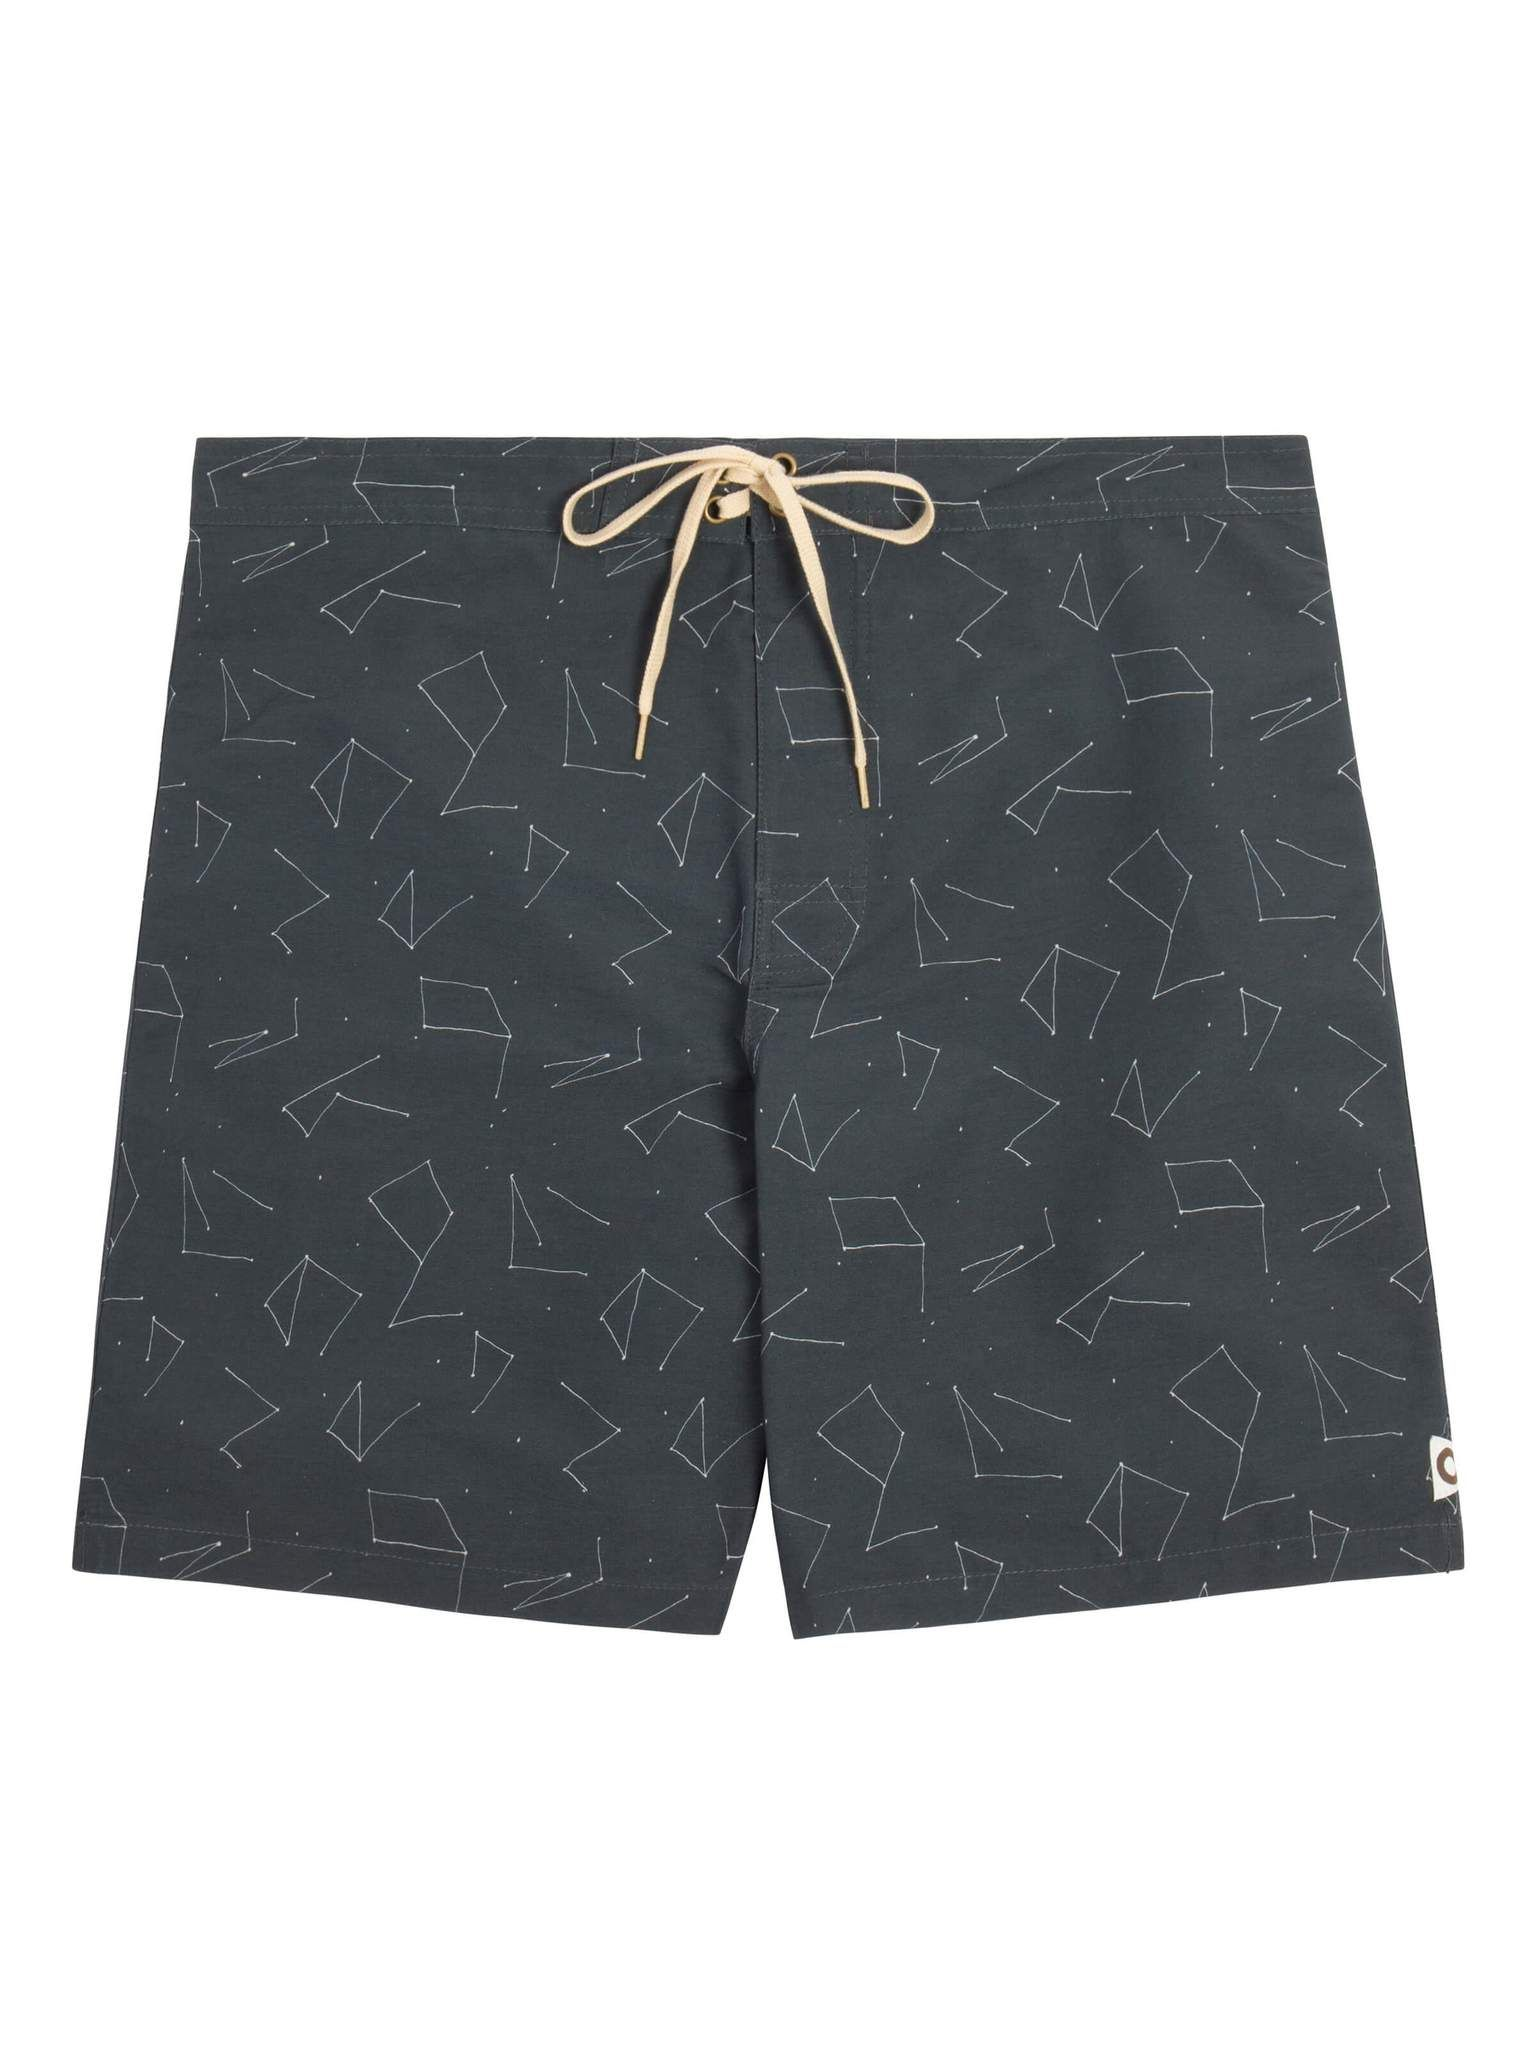 7c518044b7 Volcom Stoneys Nothing More Stoney Mens Boardshorts Size 32 Drawstring  Swimming #Volcom #BoardShorts   Shorts in 2019